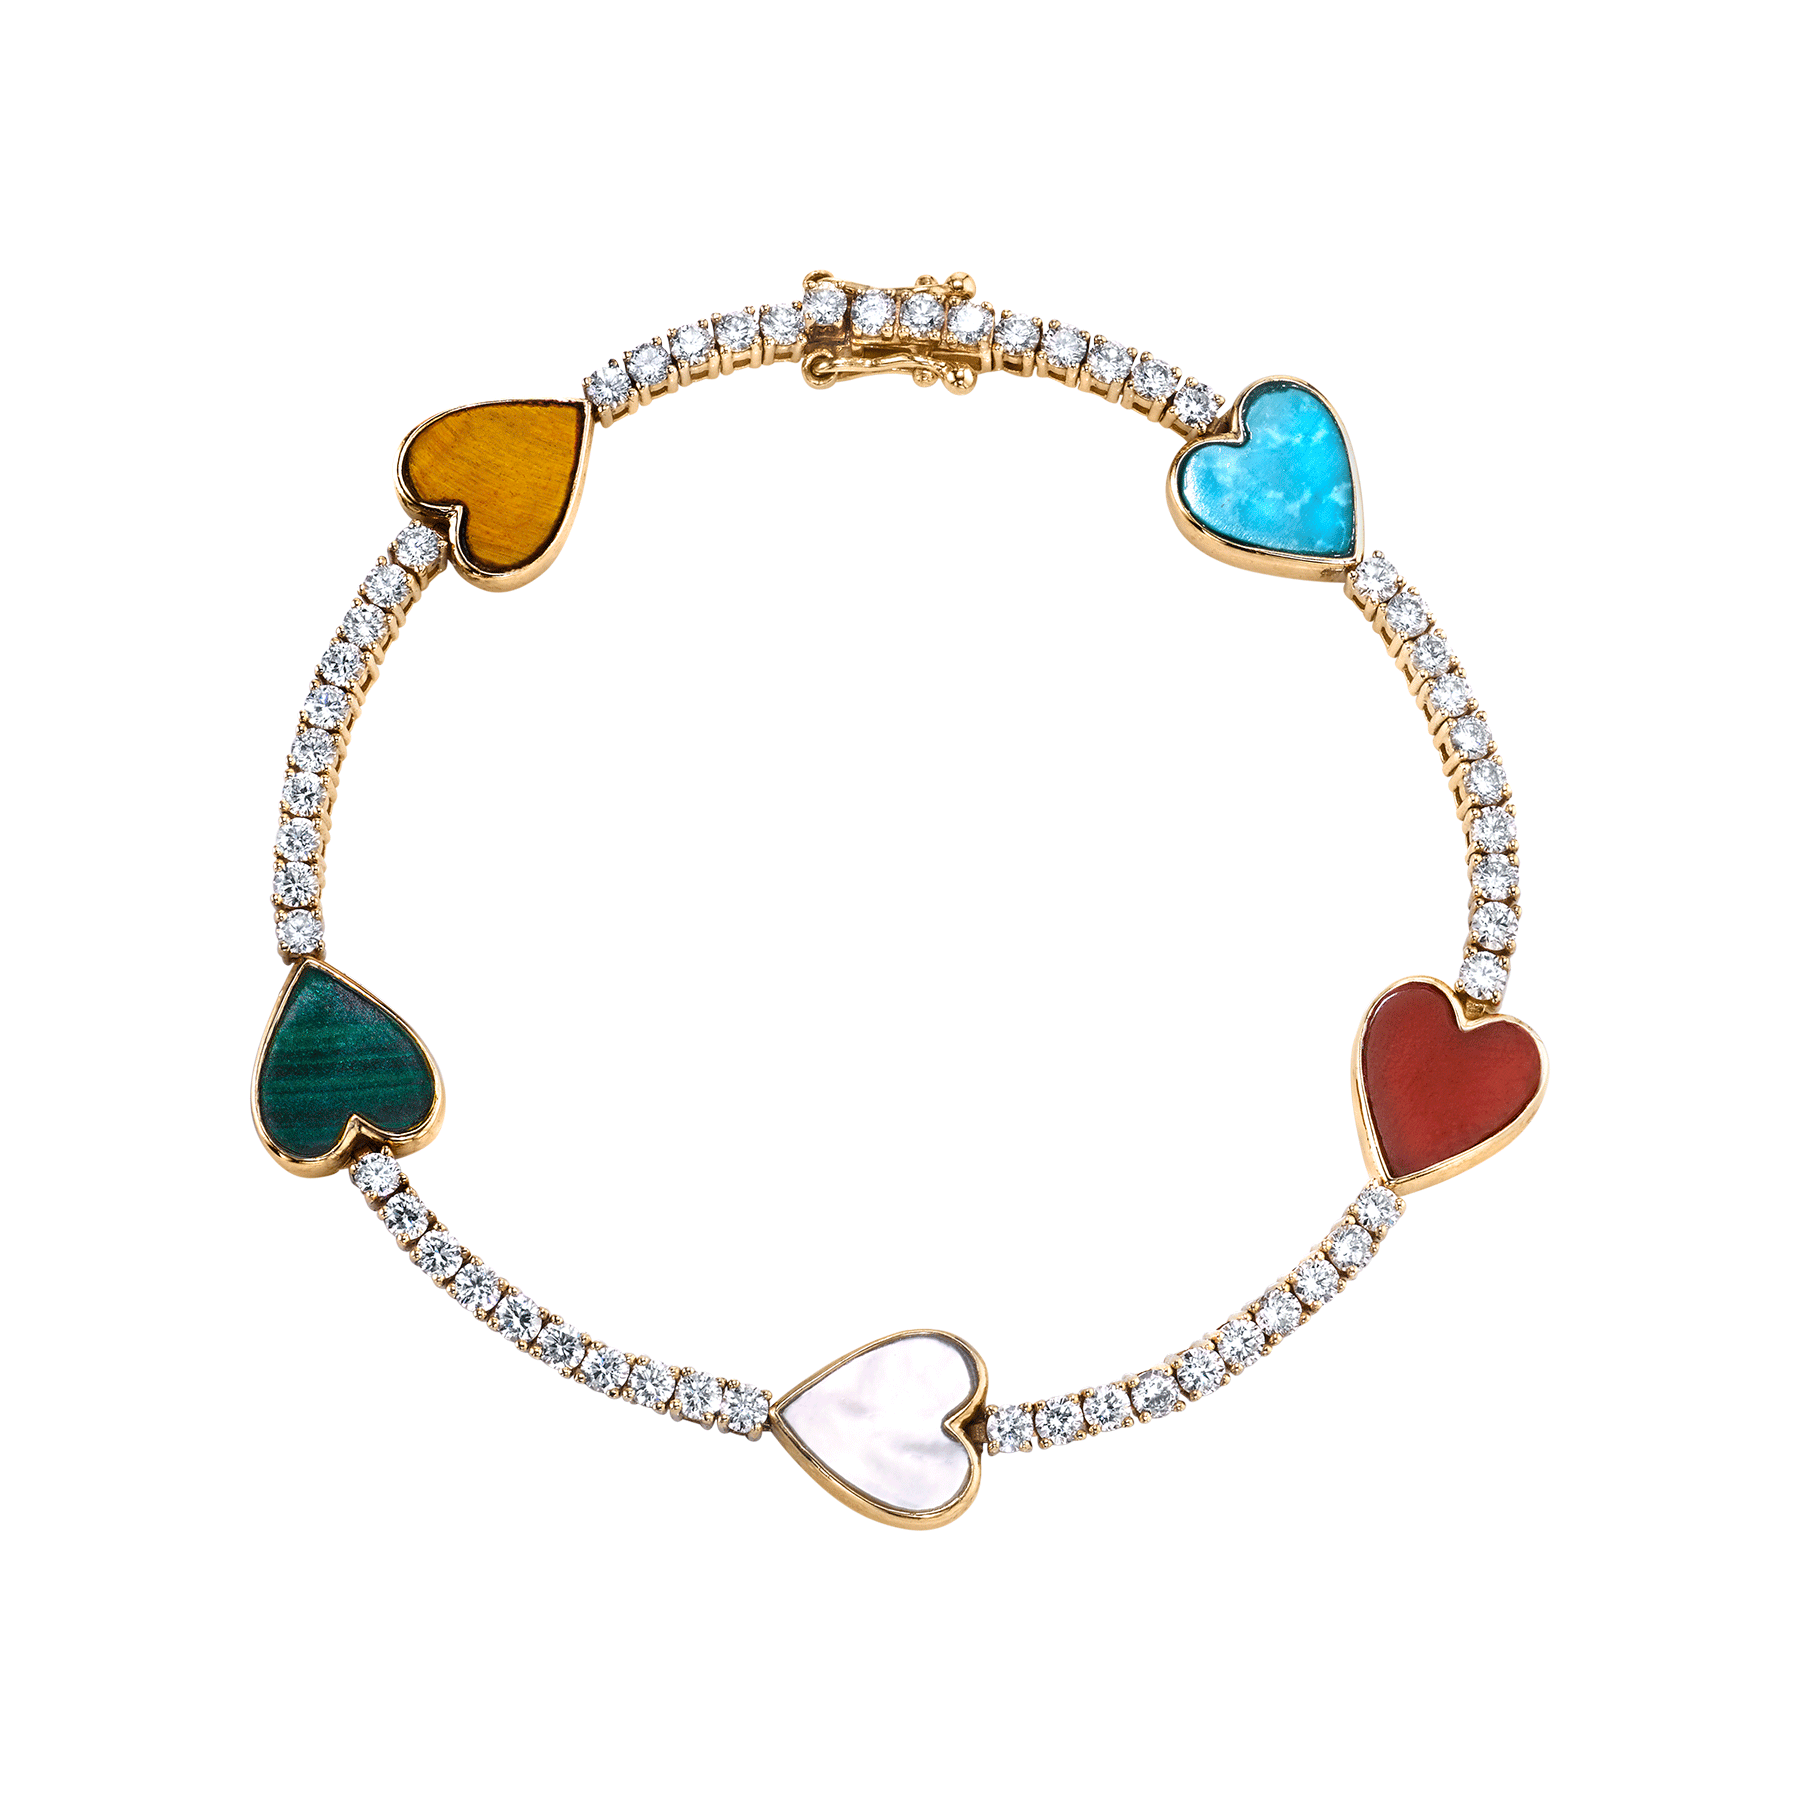 DIAMOND AND STONE HEART TENNIS BRACELET